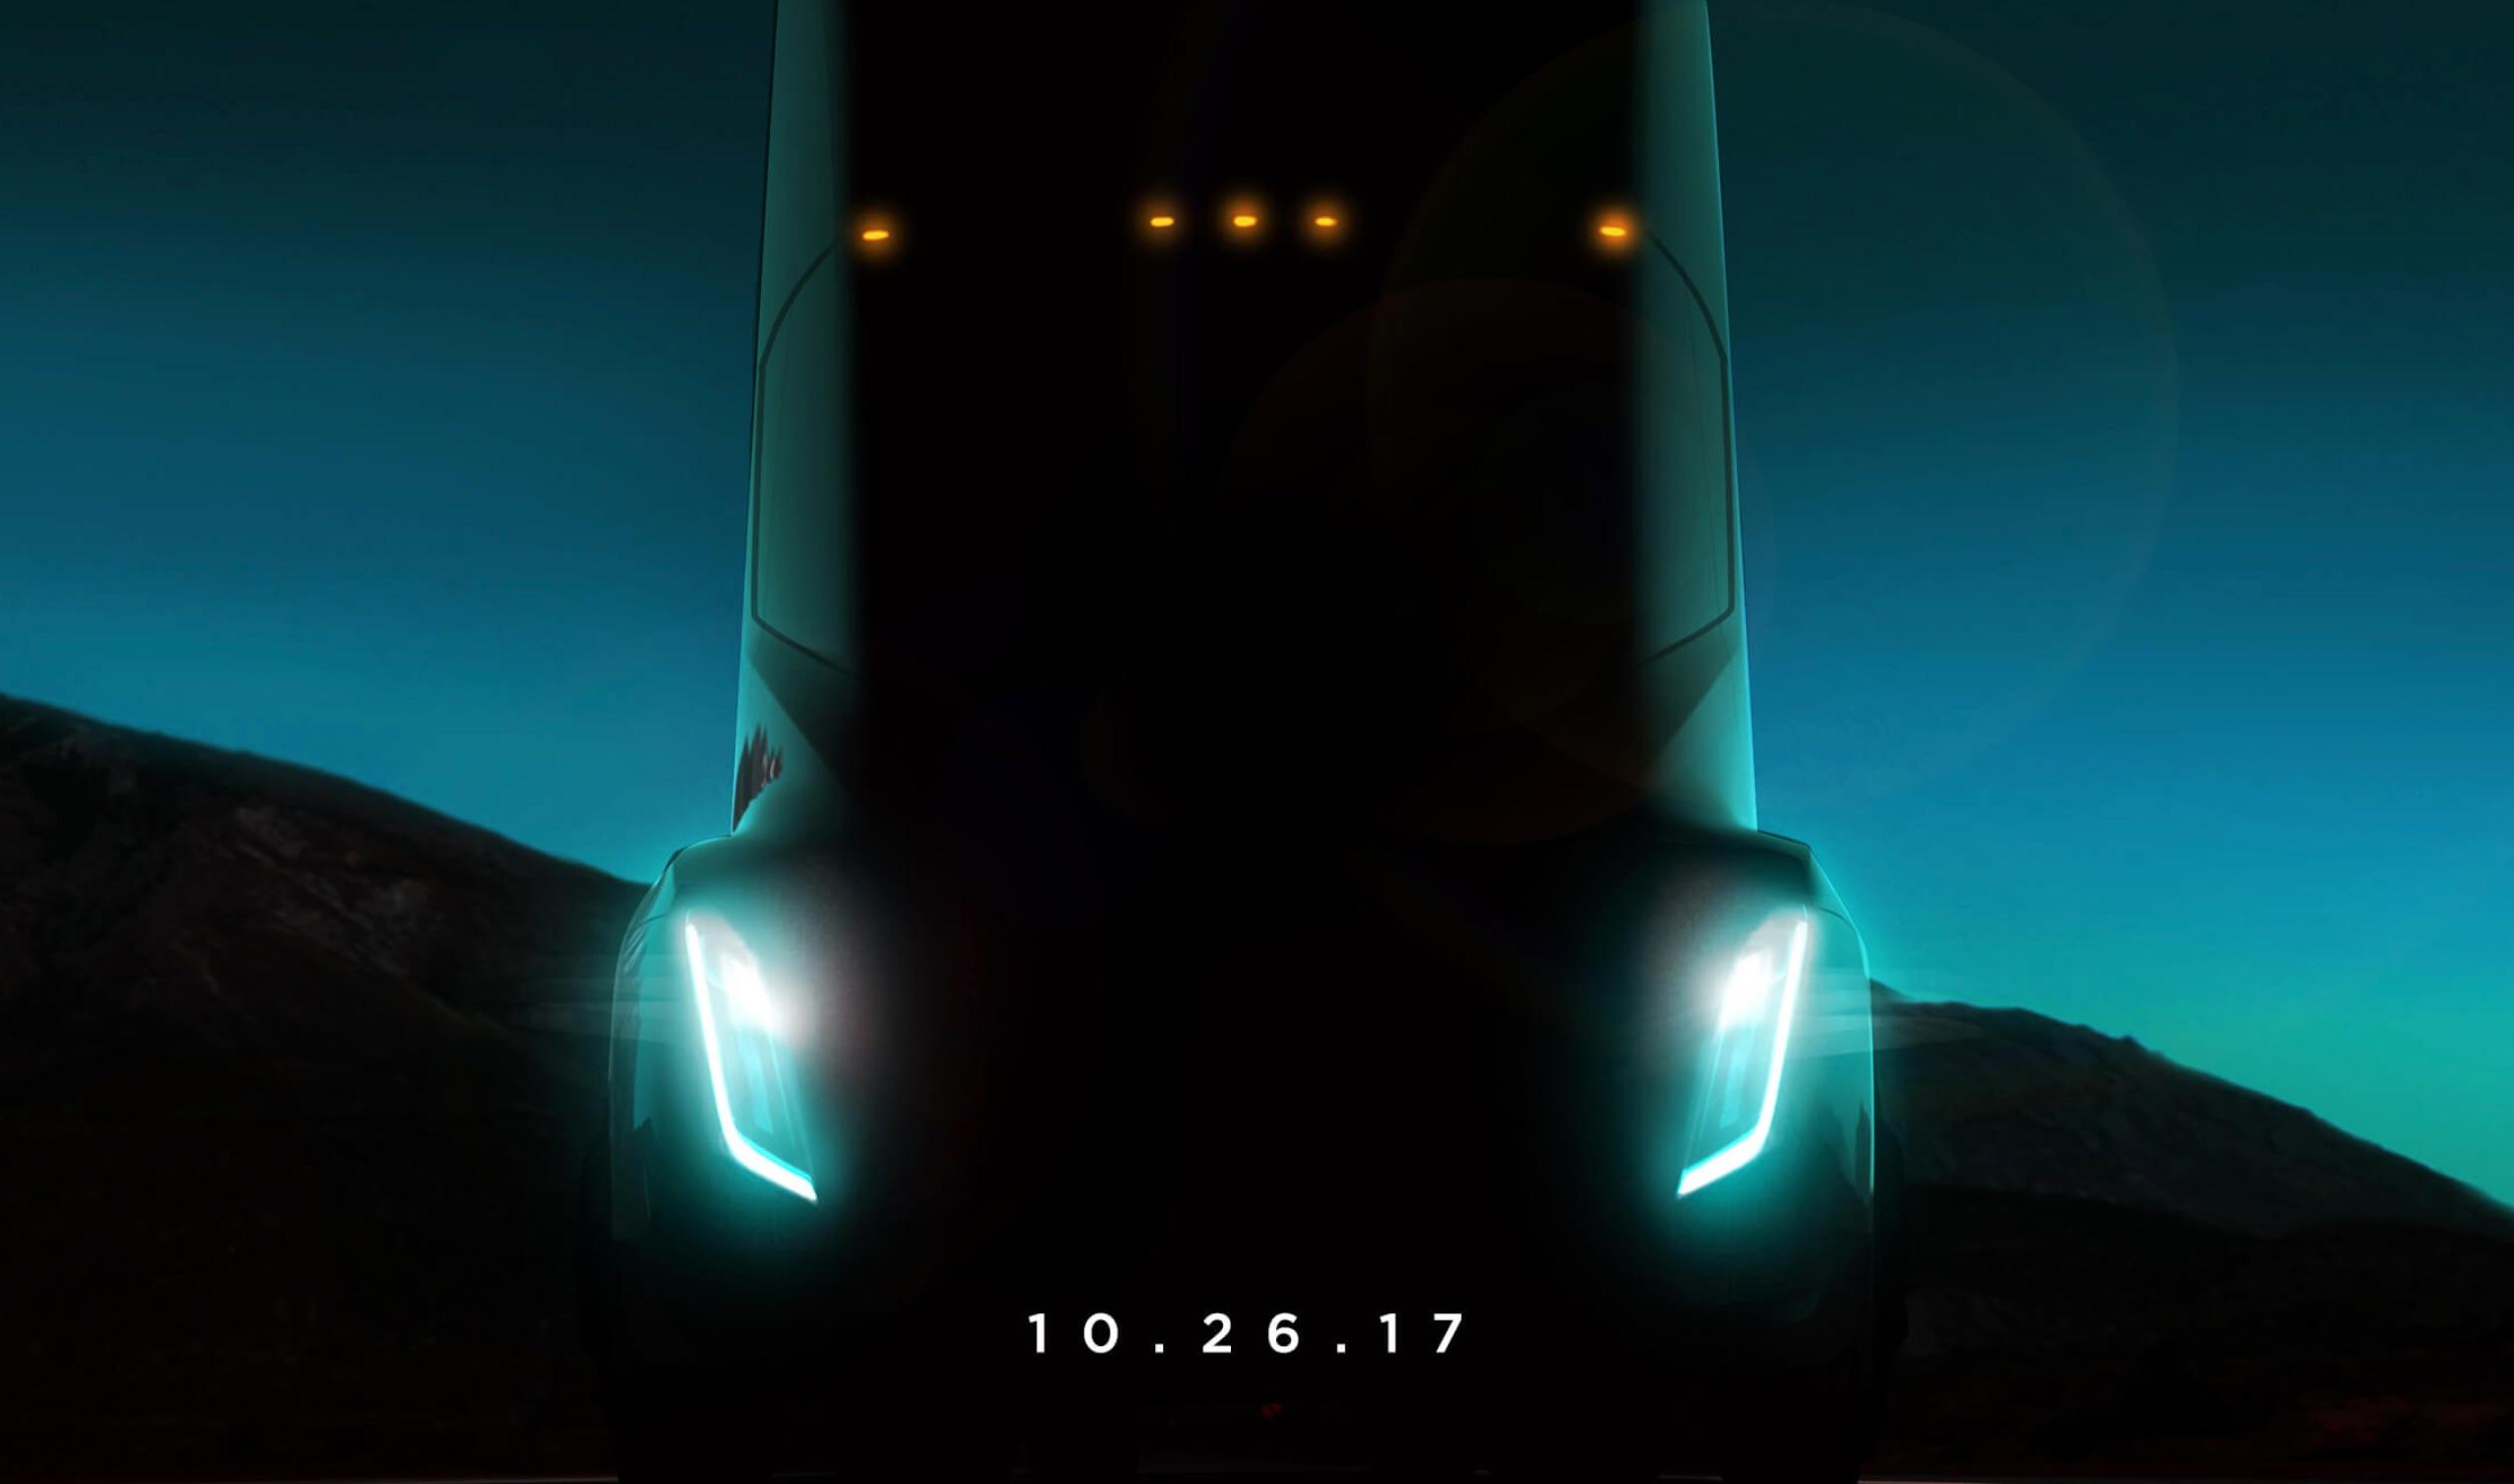 tesla-semi-truck-event-10-26-2017-invitation-teaser